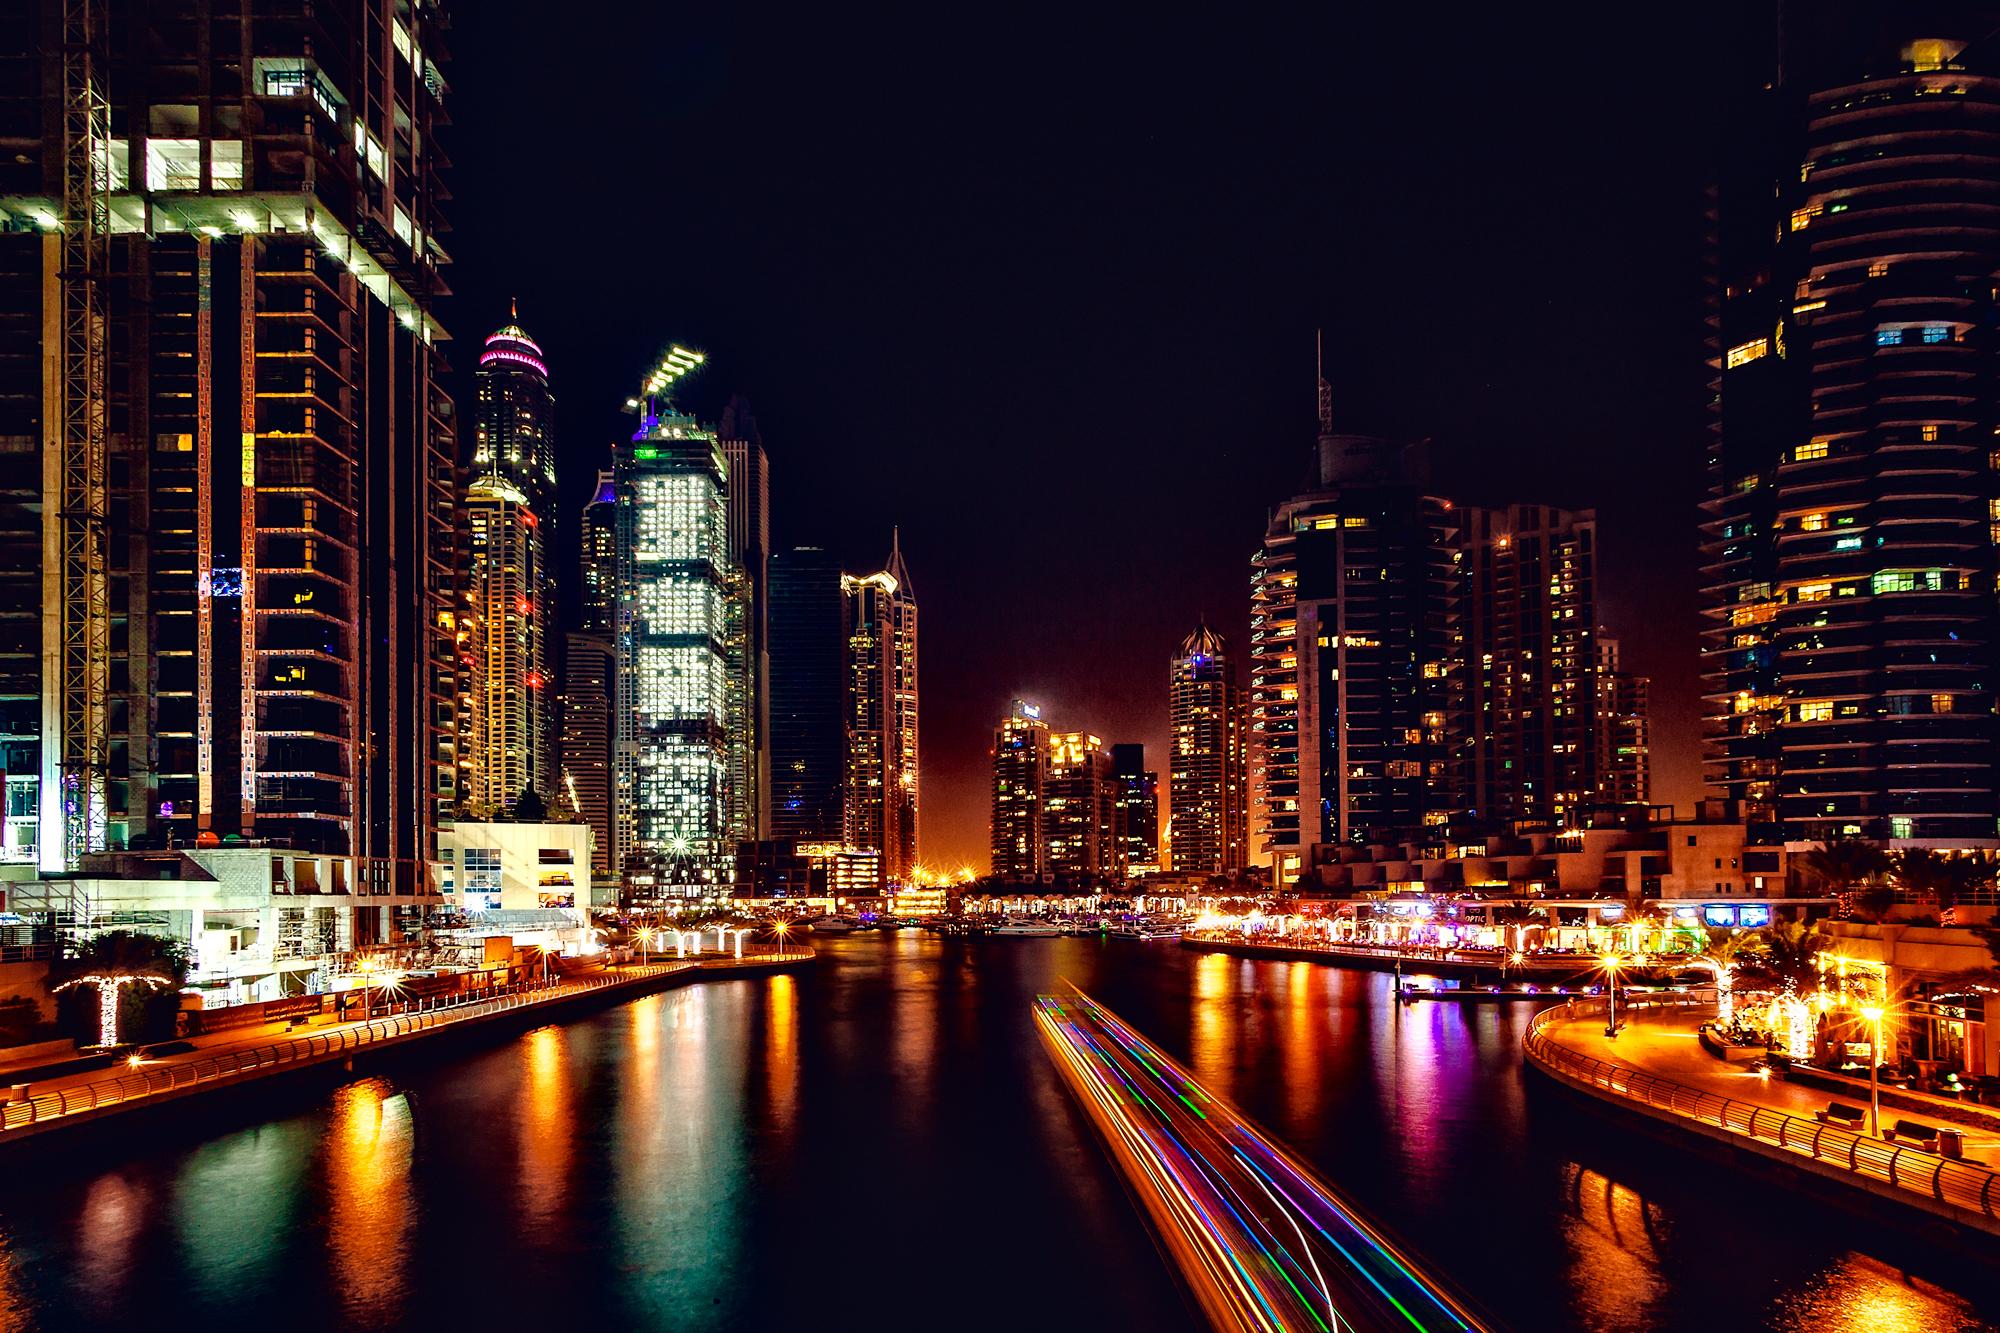 The-night-of-Megapolis.jpg